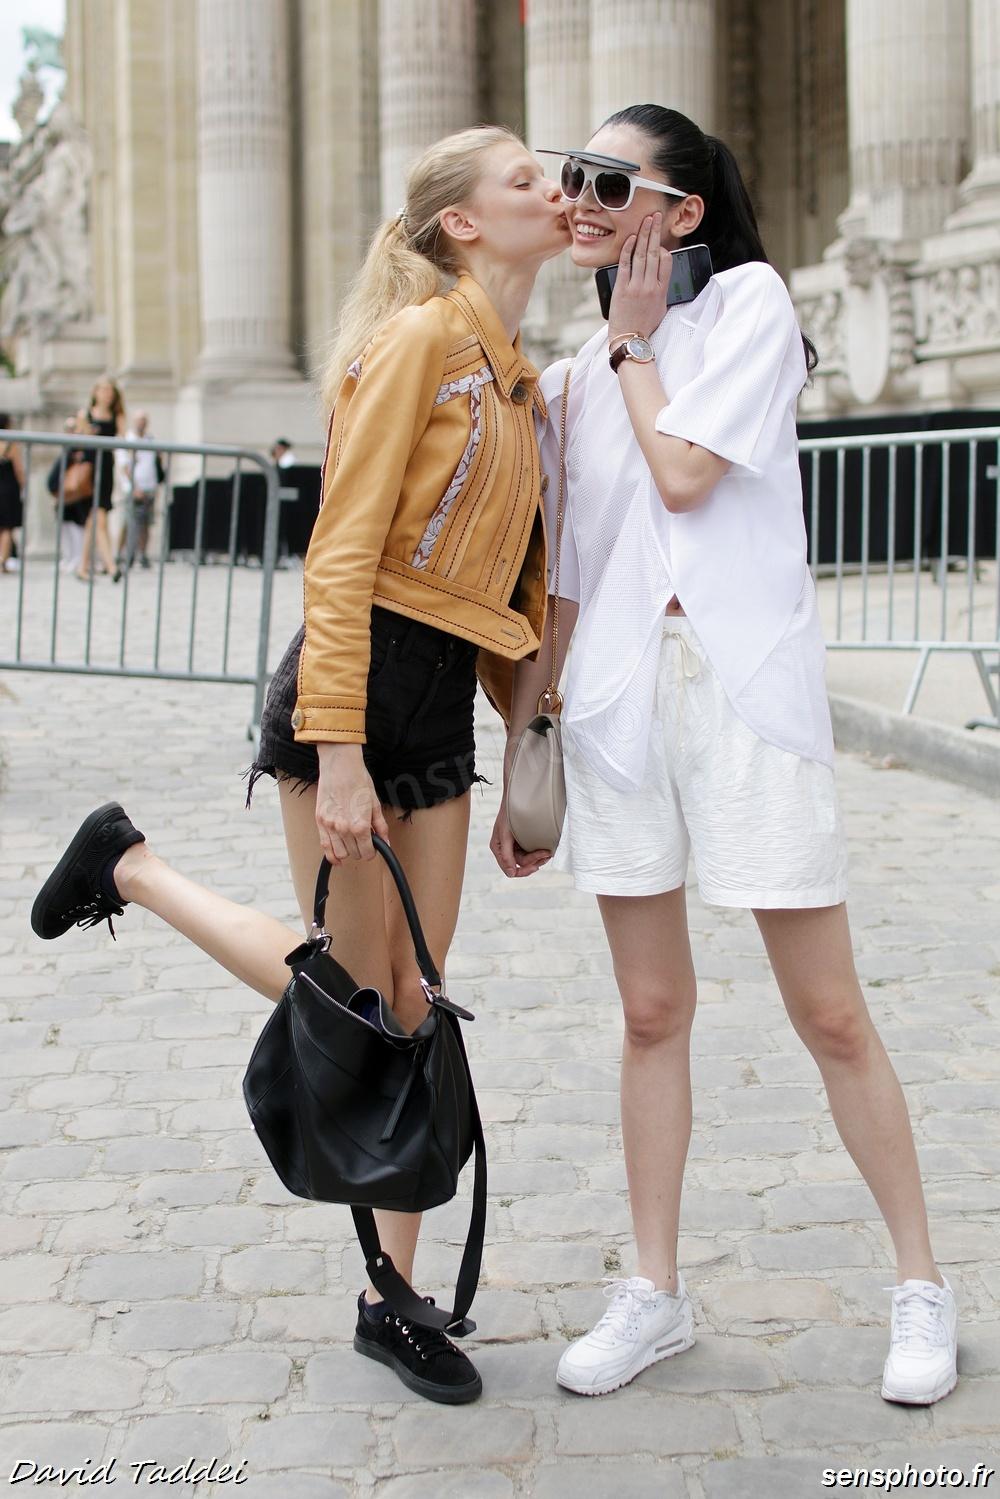 a model and Ming Xi, Paris Fashion Week Chanel